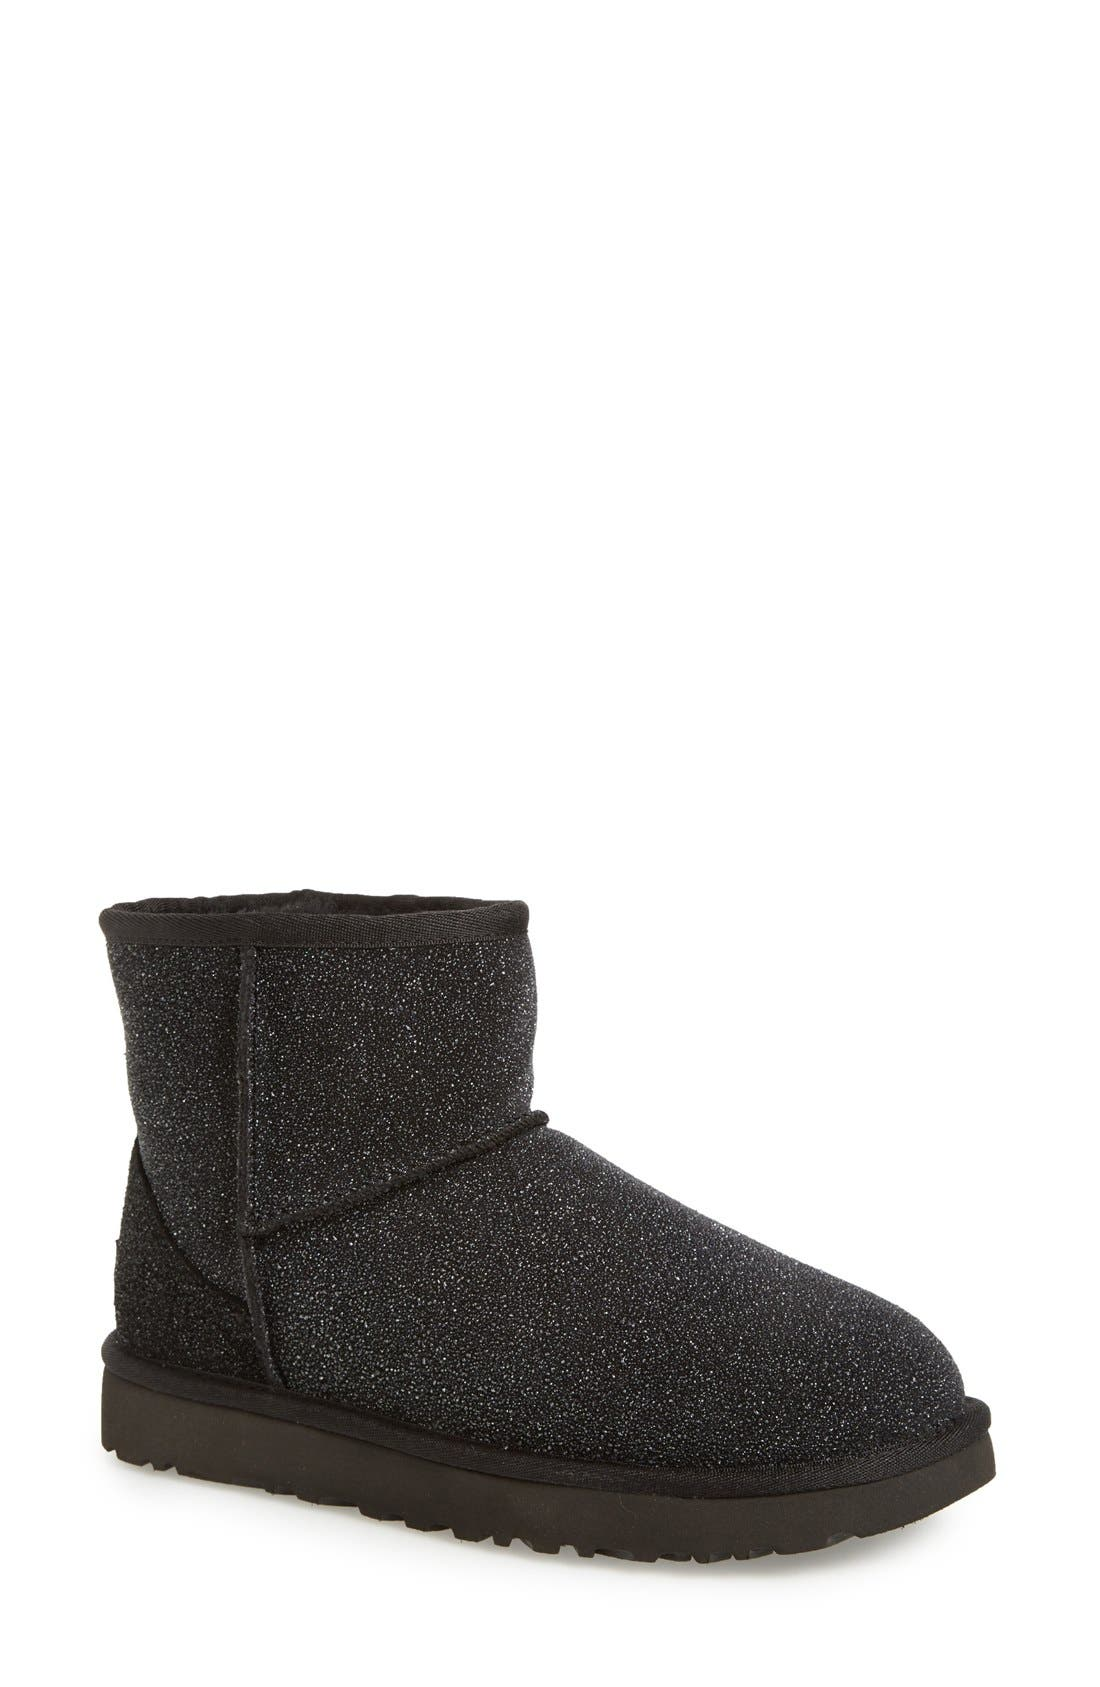 UGG 'Classic Mini Serein' Genuine Shearling Boot, Main, color, 001